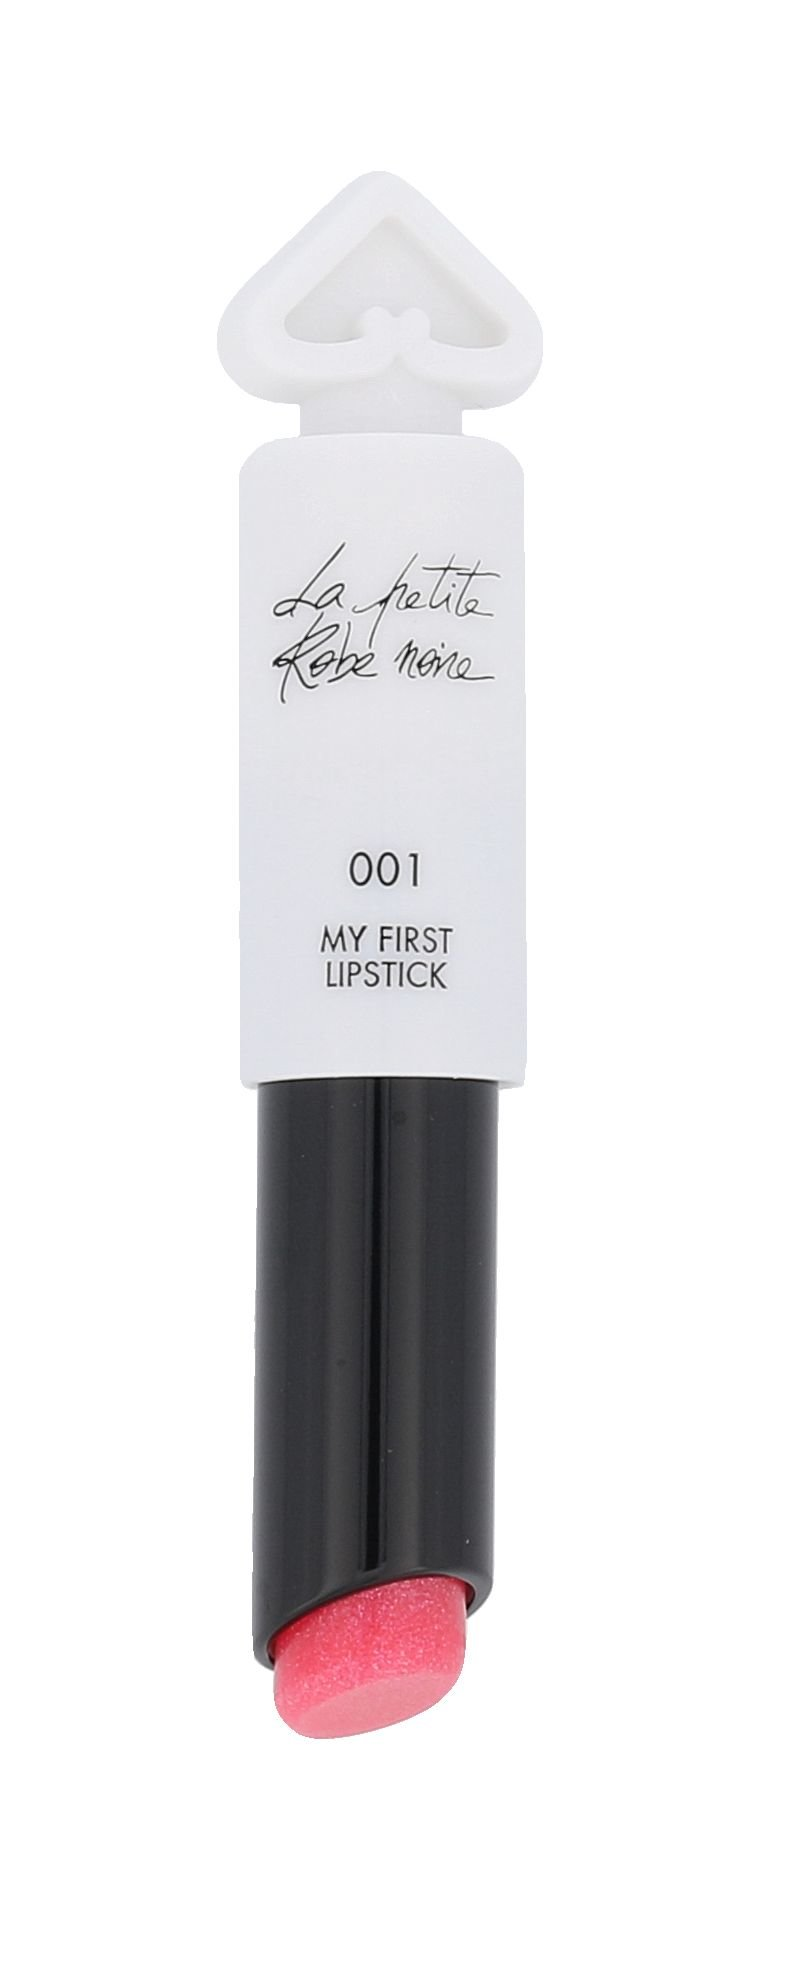 Guerlain La Petite Robe Noire Cosmetic 2,8ml 001 My First Lipstick